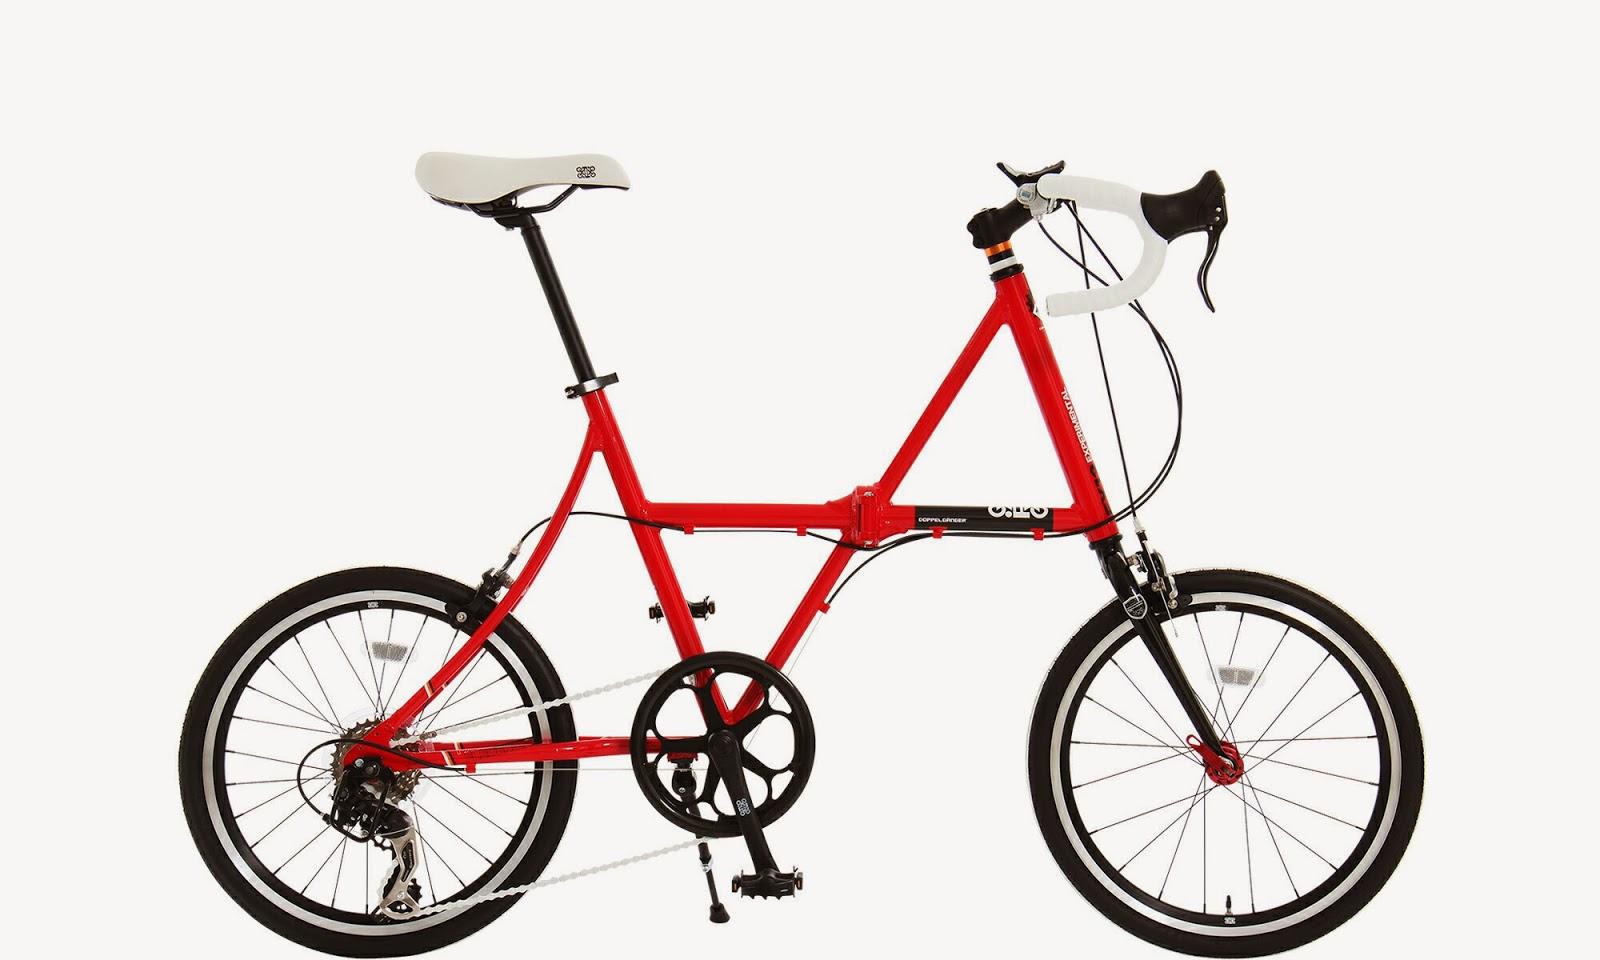 KISH_April 2013 (17 of 32)-L | Bmx bikes, Bicycle, Road